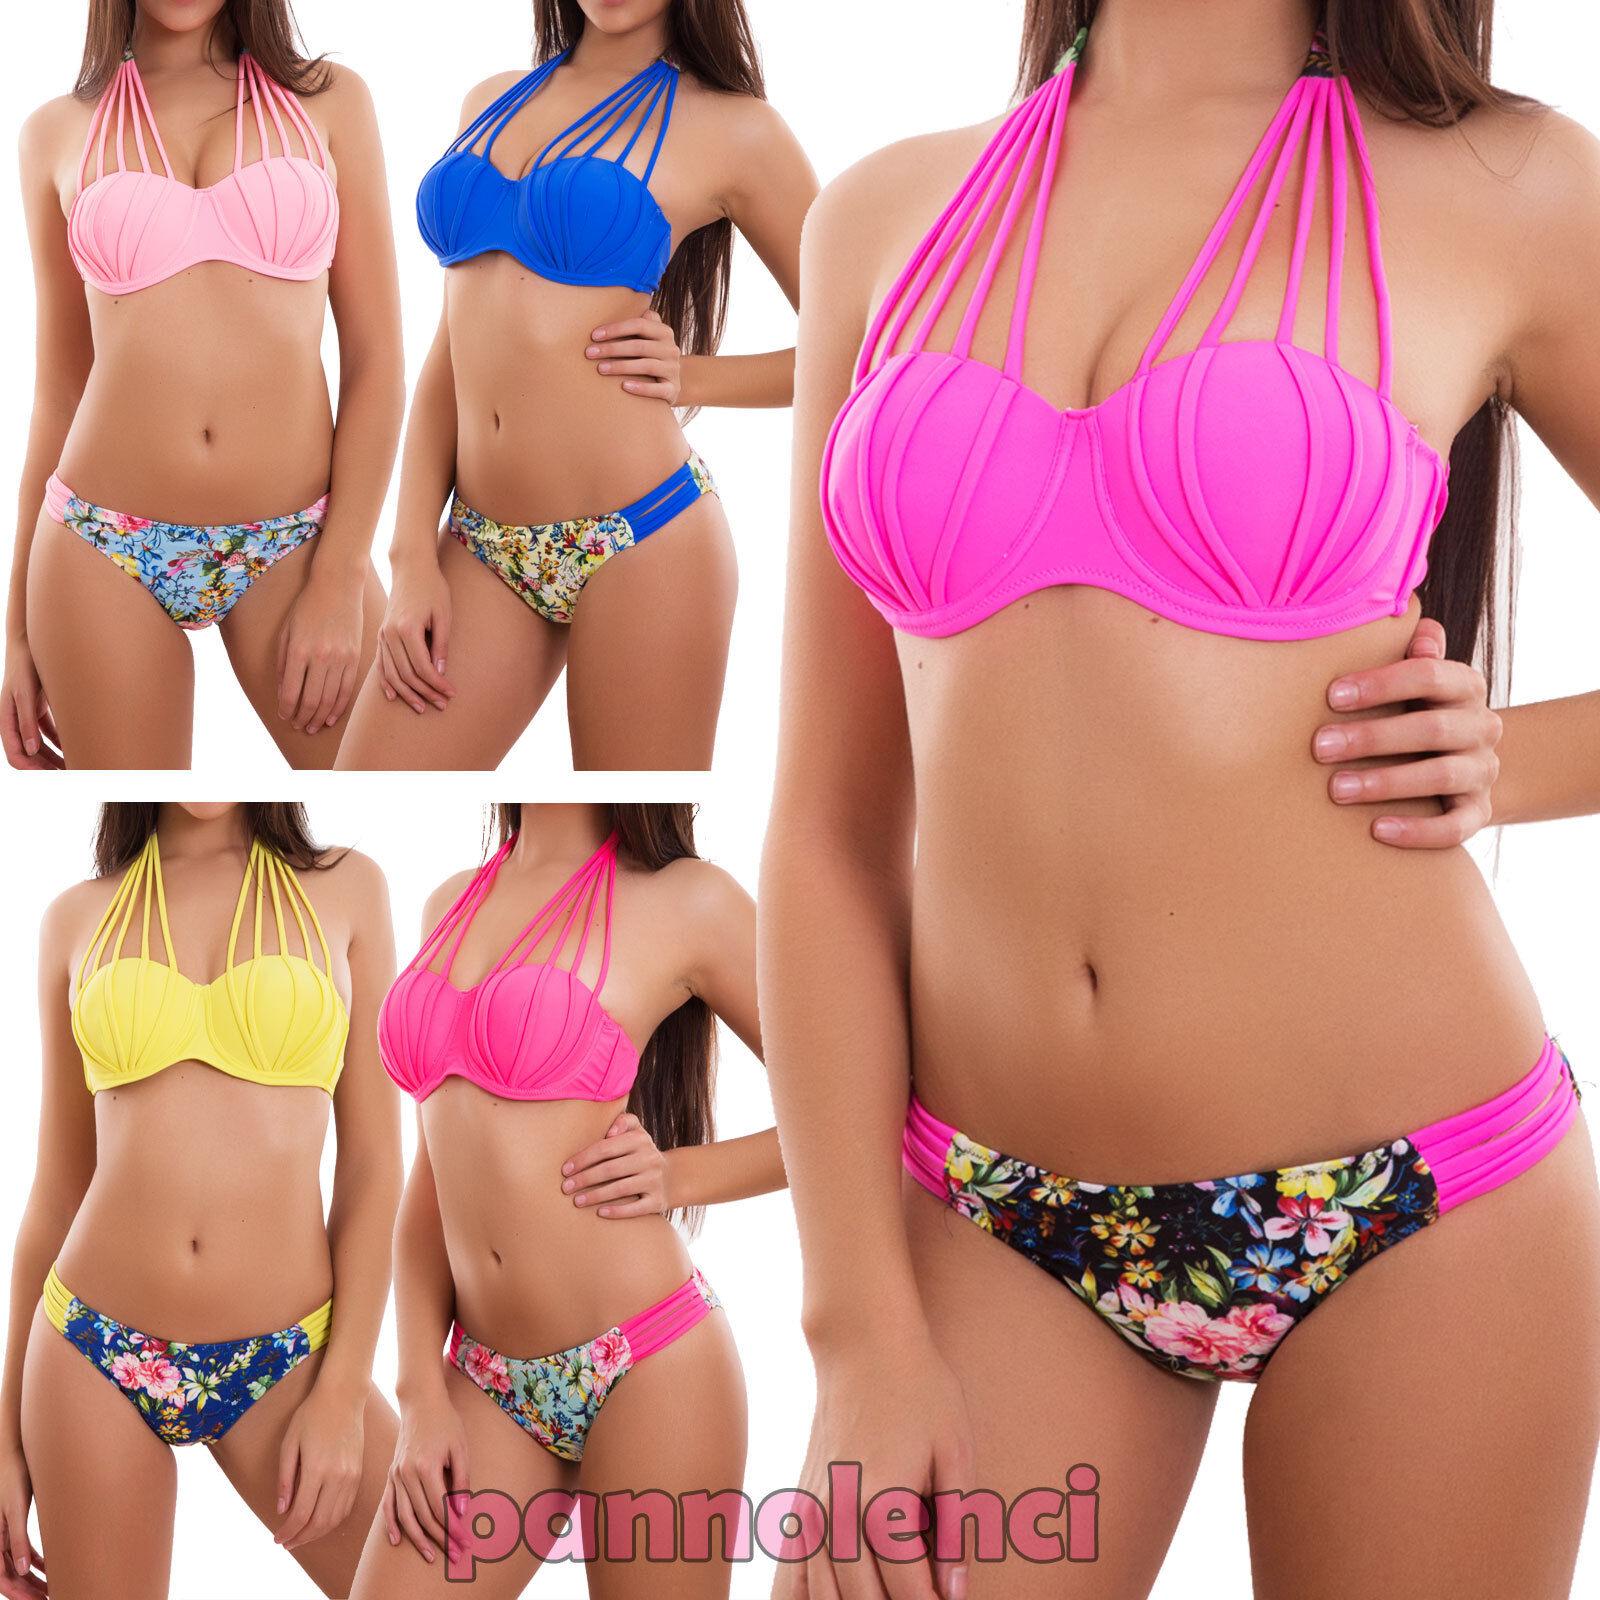 9fdeeb41e8b6 Detalles de Bikini Mujer Traje de Baño Mar Slip Cordones Flores Push Up  Sexy Nuevo A8926